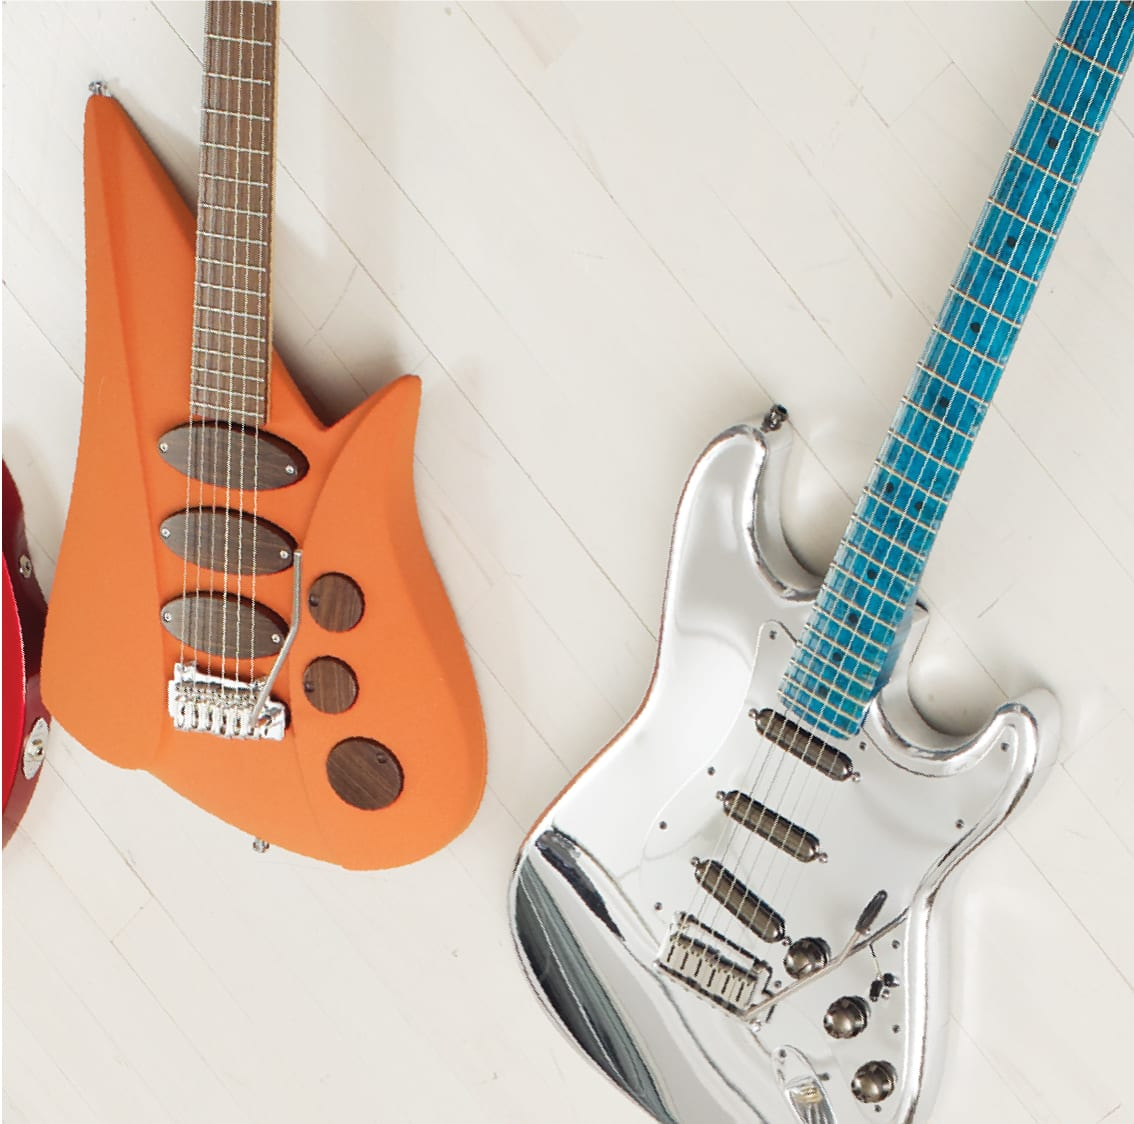 From left, Fender ALumium Stratocaster, Hendrick Generator.